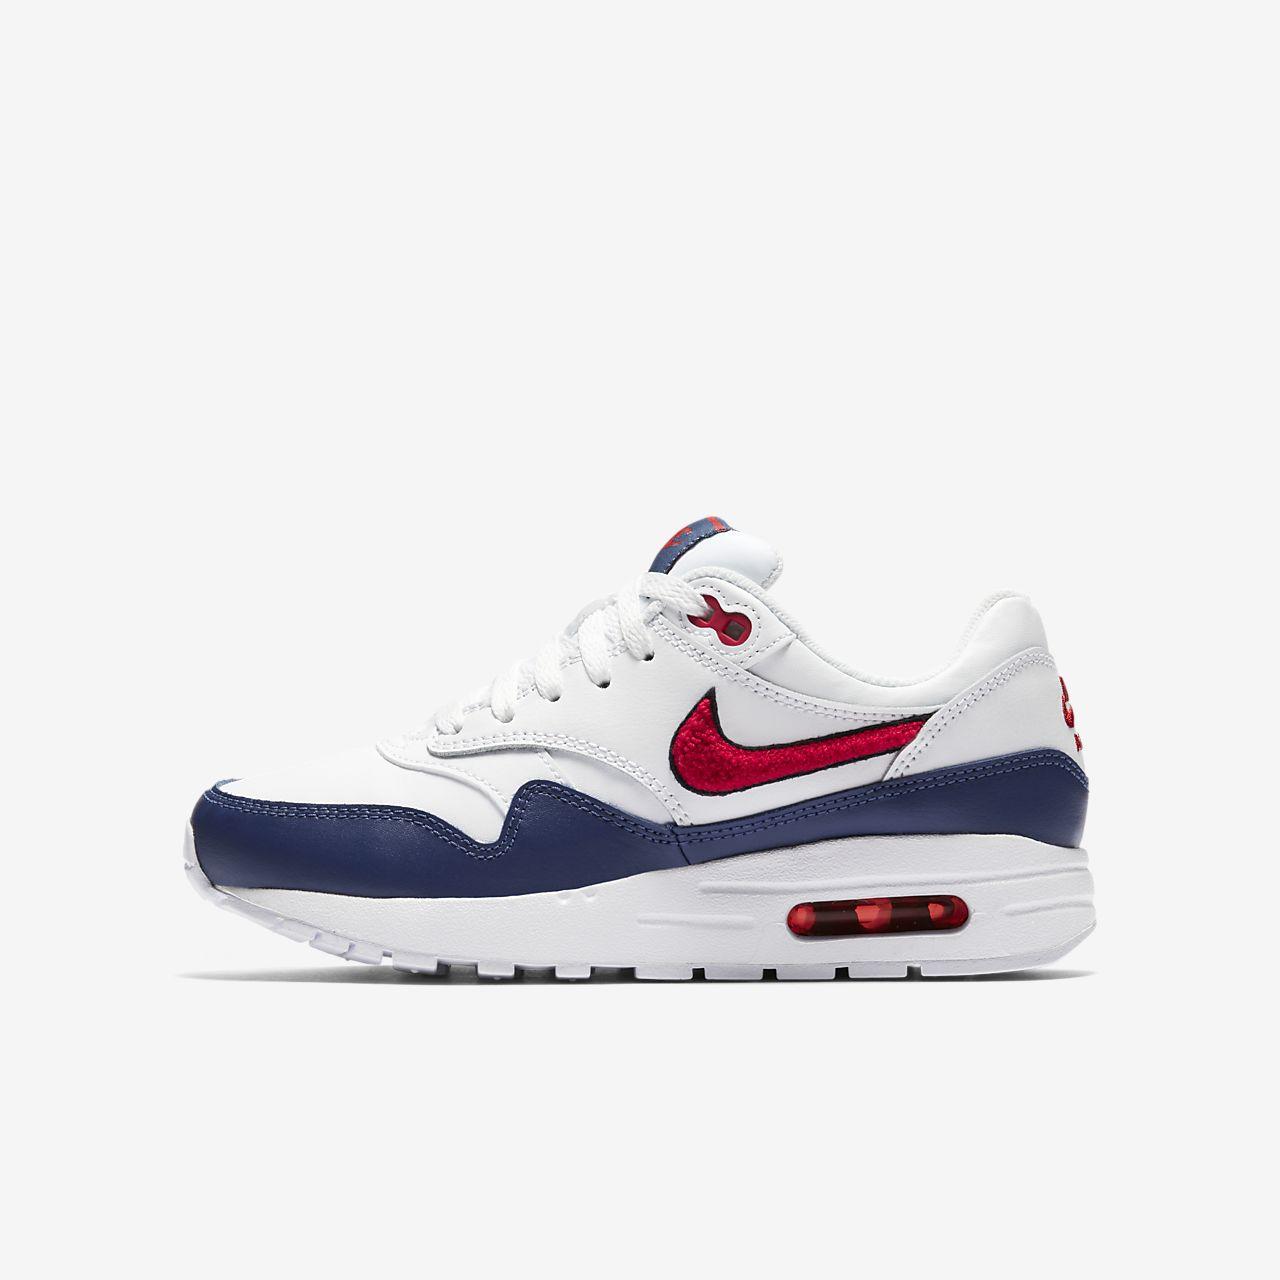 competitive price 471f4 1f0c1 ... Nike Air Max 1 SE-sko til store børn